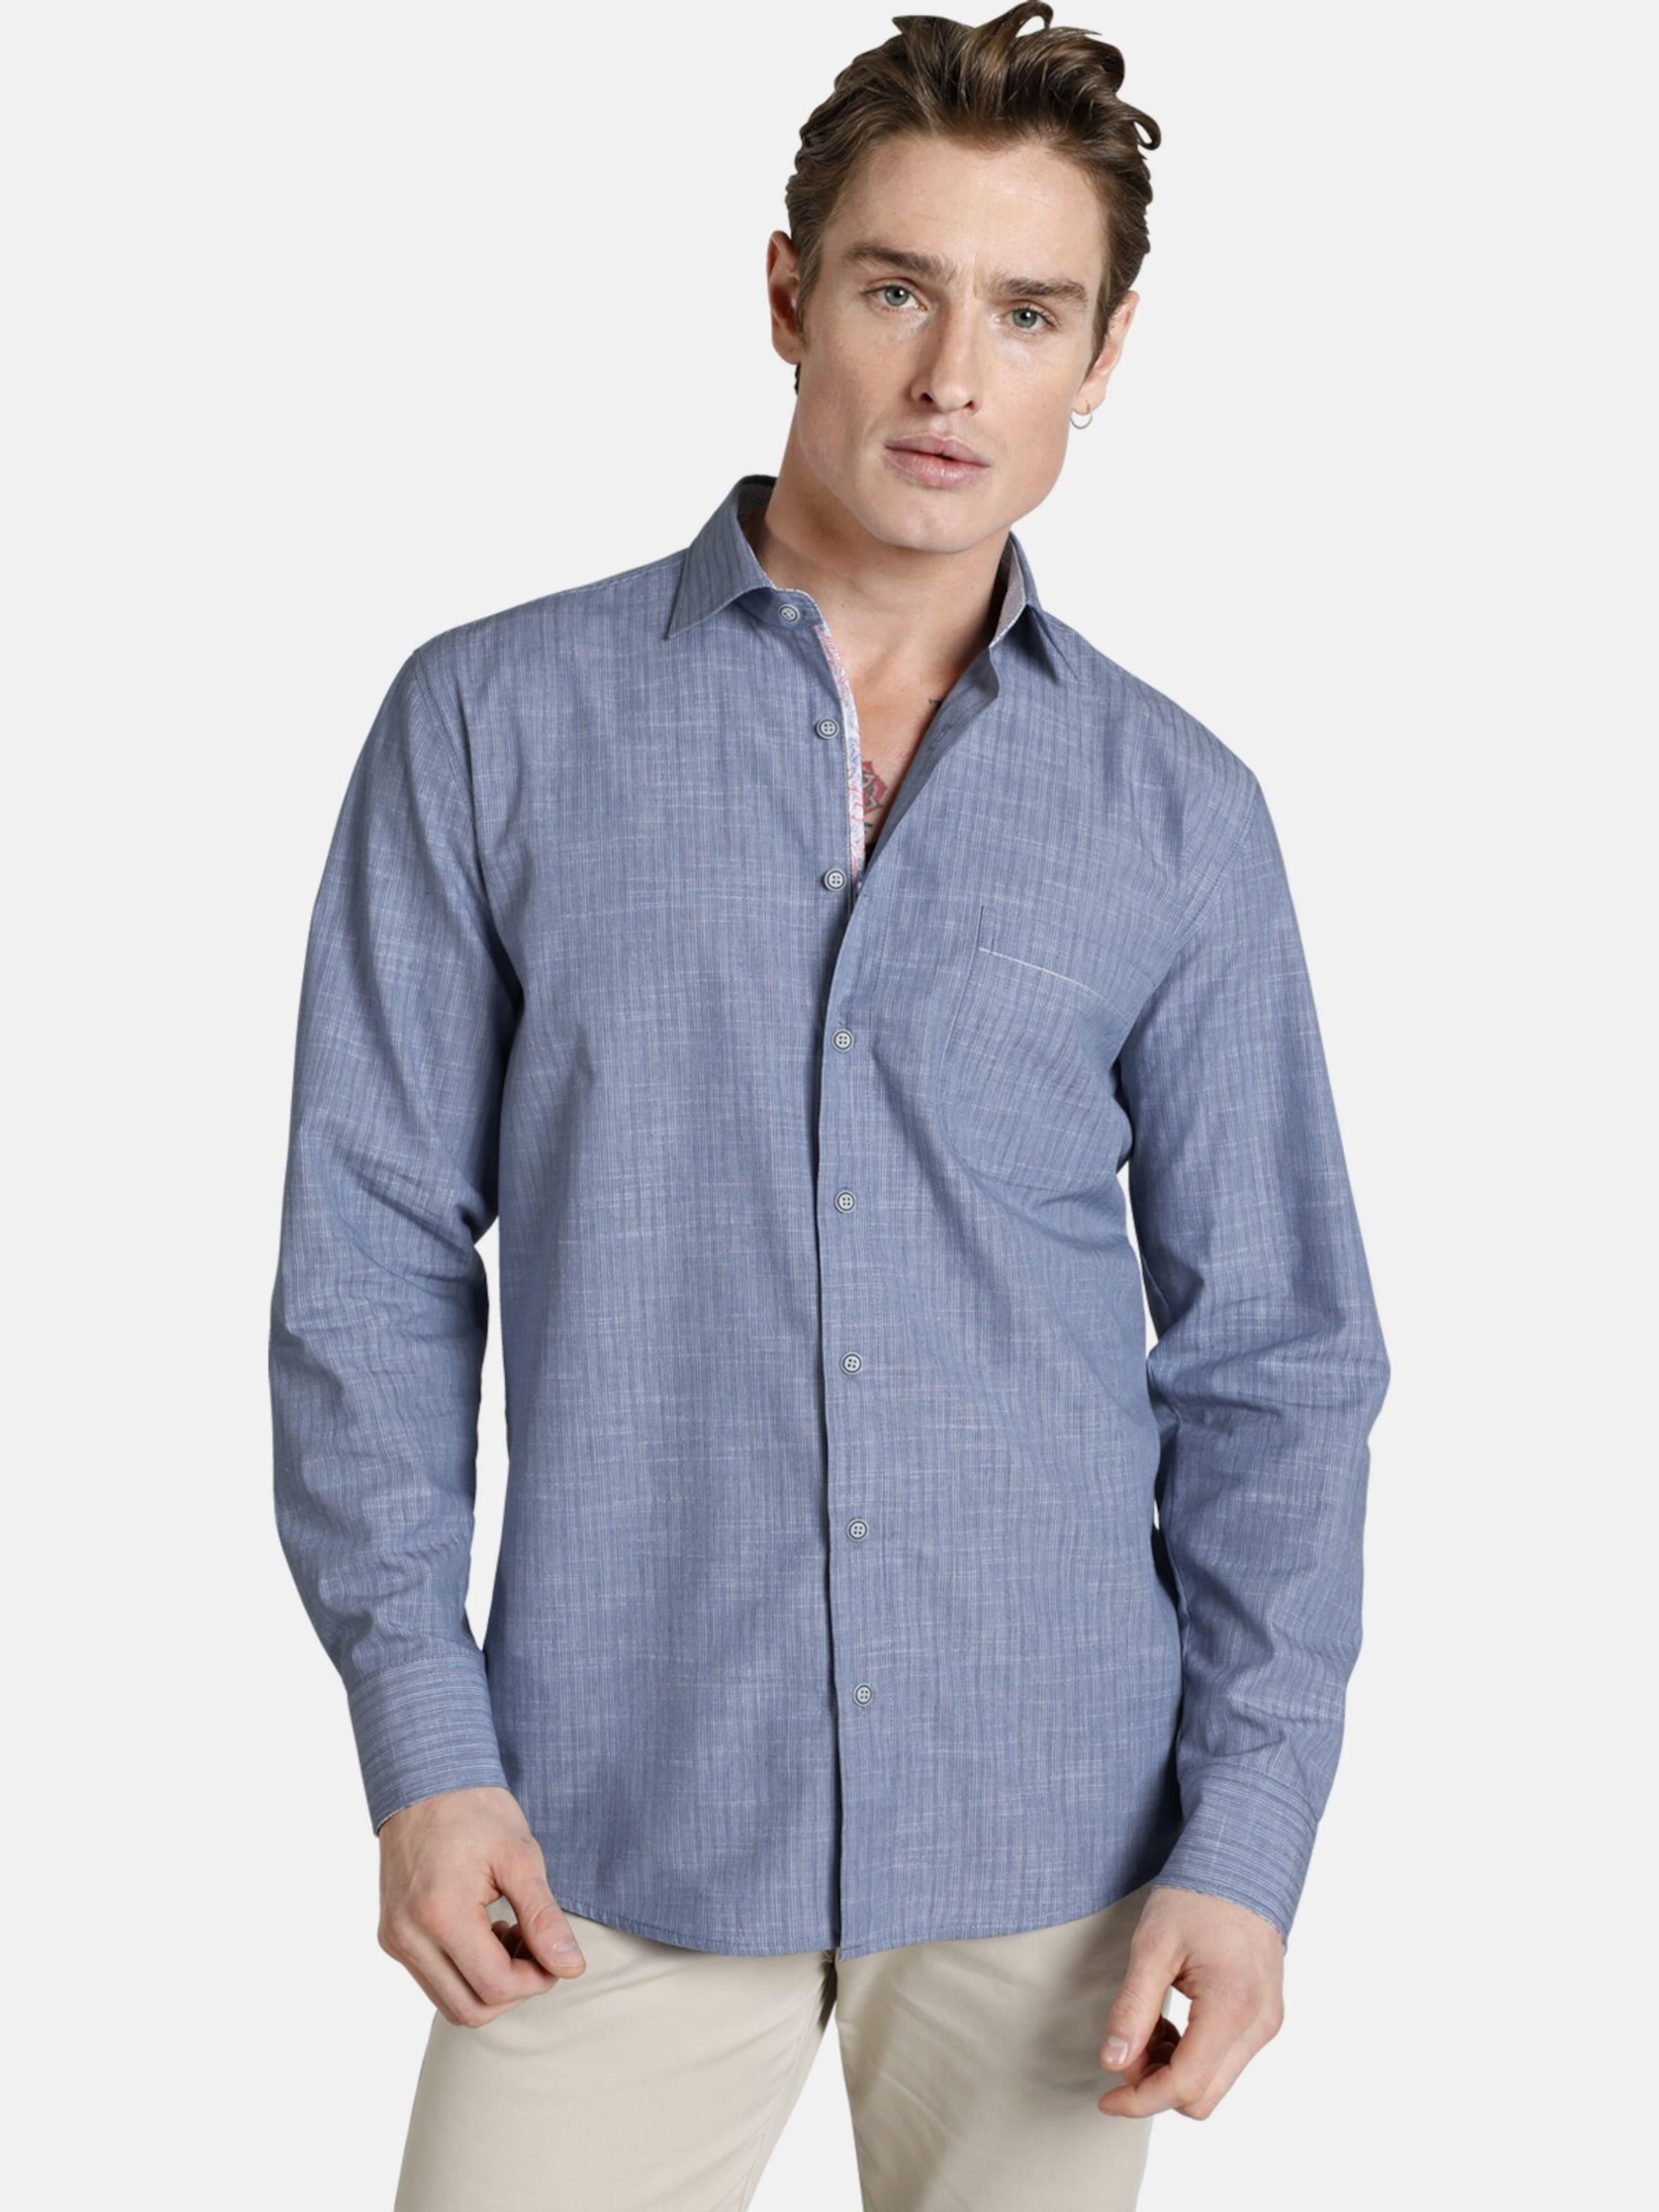 Hemd In 'blueandcoral' Shirtmaster 'blueandcoral' Shirtmaster Blau Hemd eEID92YWH